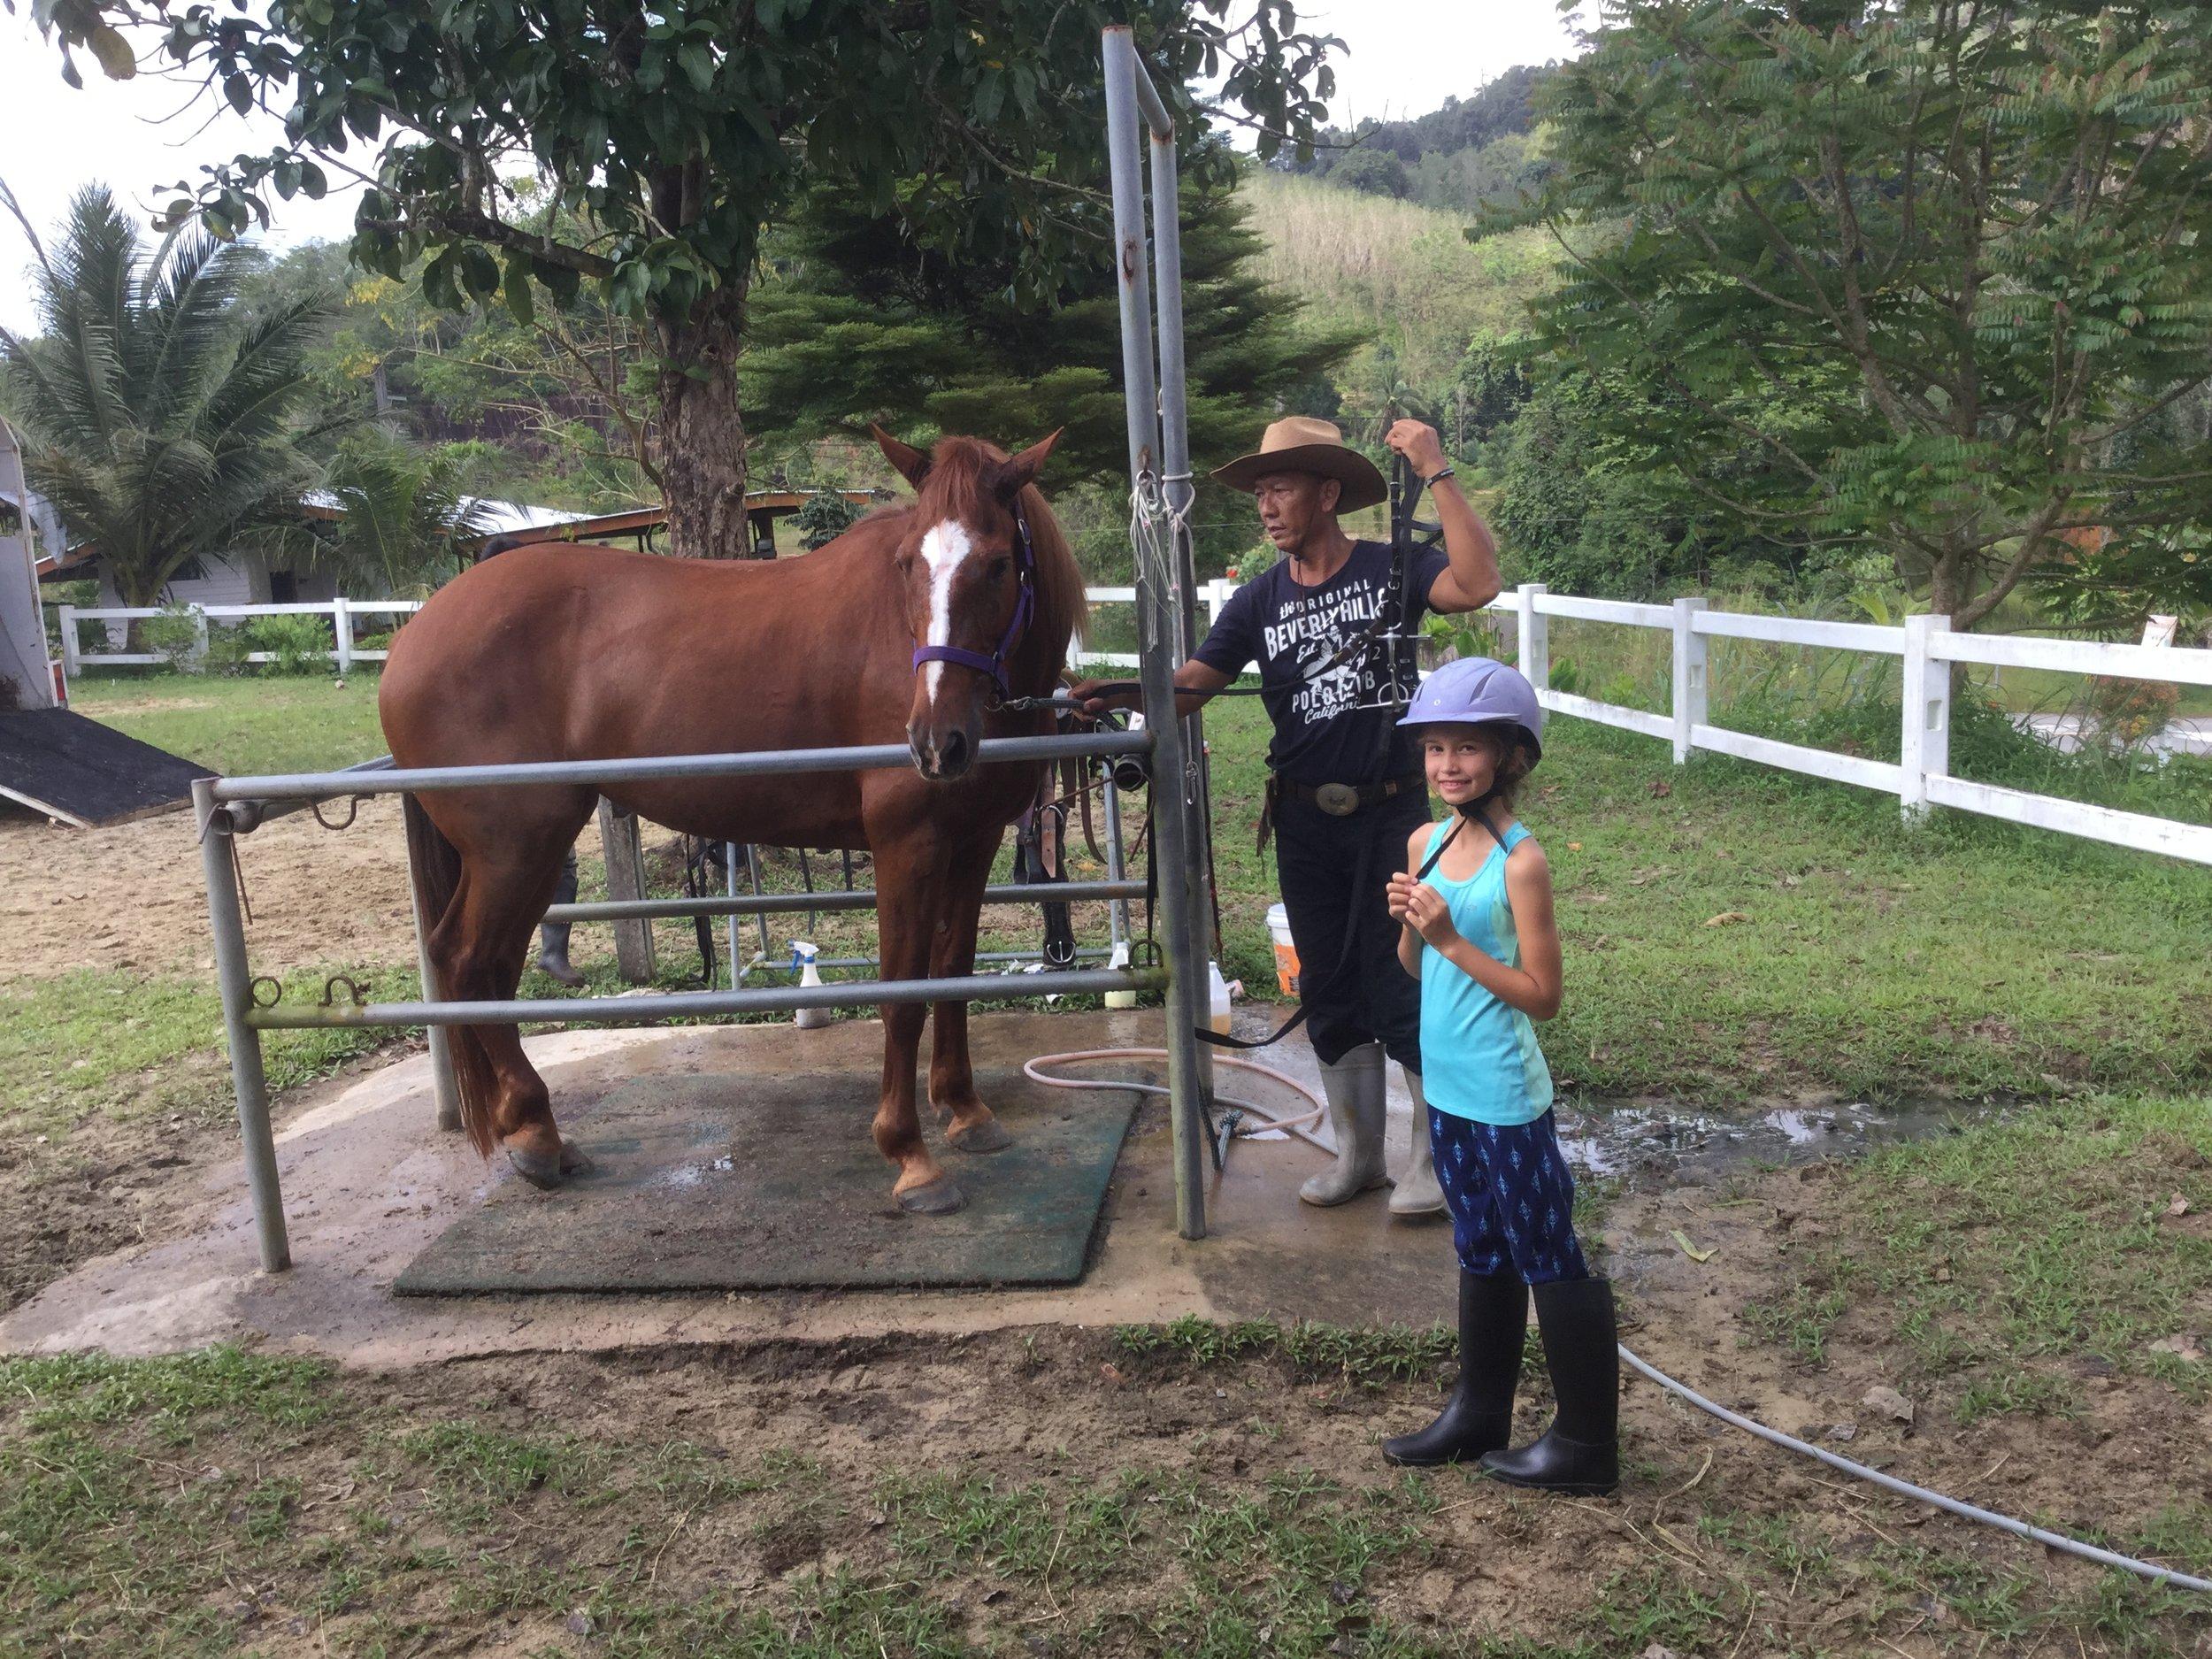 The horse, Bella, being prepared.